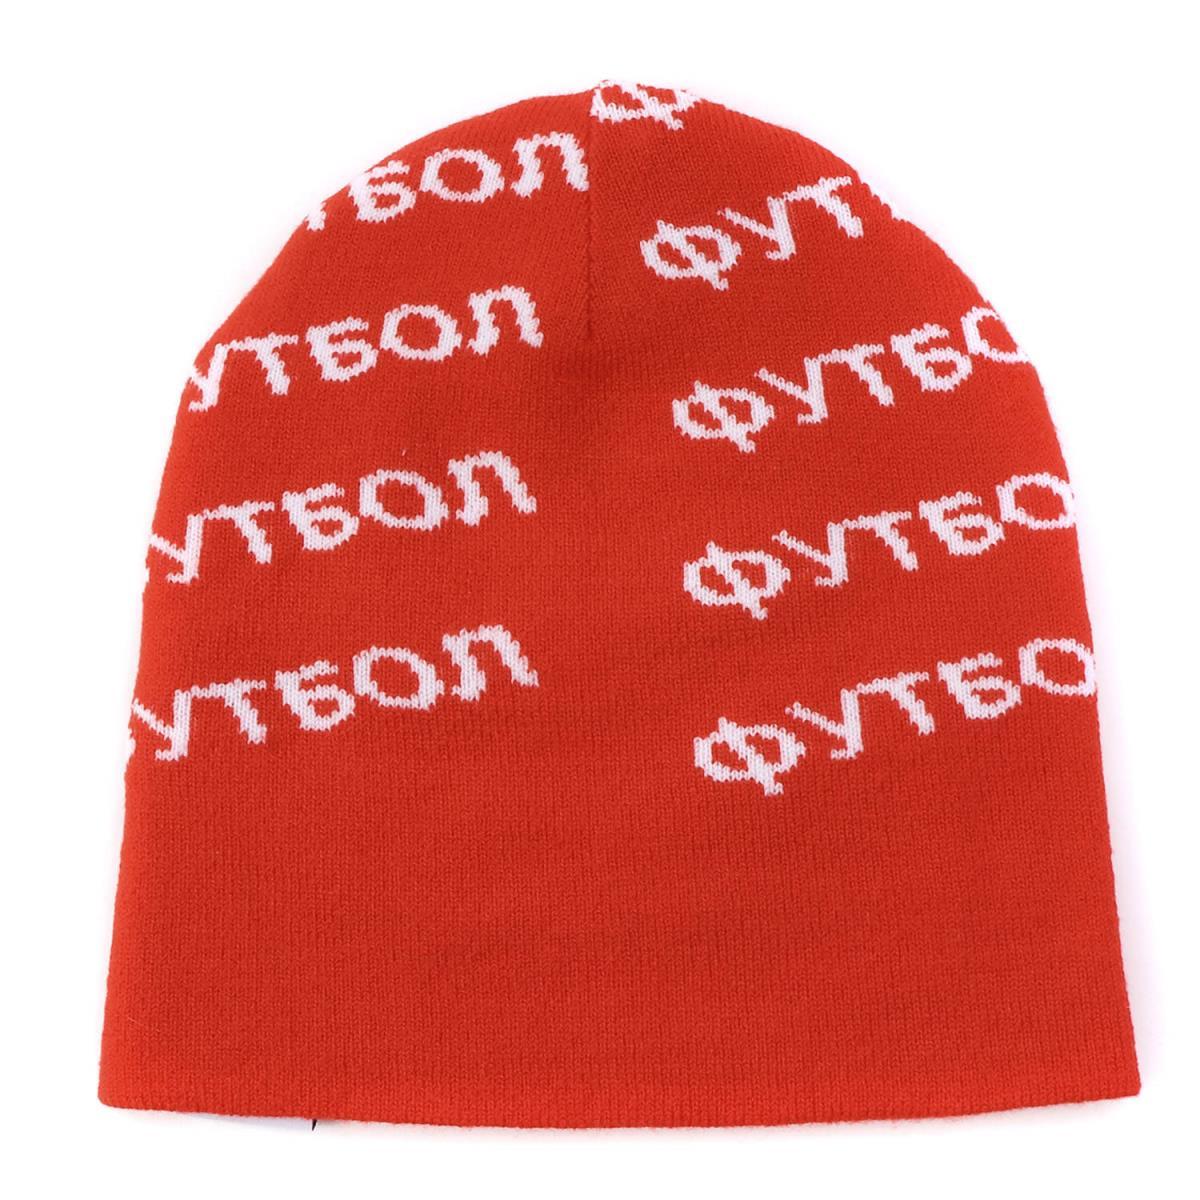 9b38c2f823b Gosha Rubchinskiy (go Schalla butyne ski) 17A W X adidas monogram logo knit  beanie red